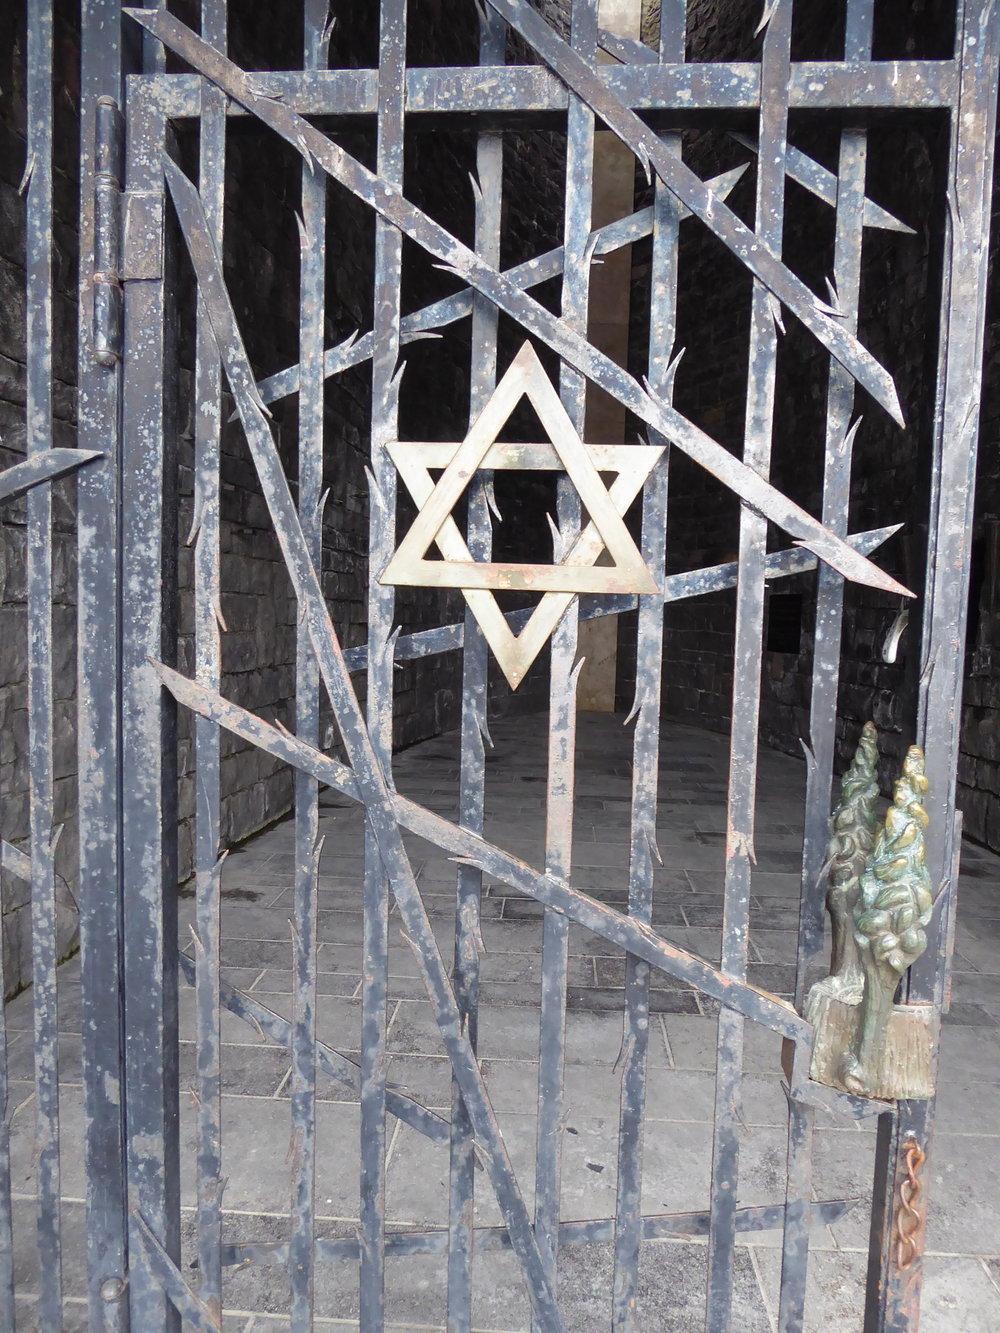 Gate of the Jewish memorial at Dachau.